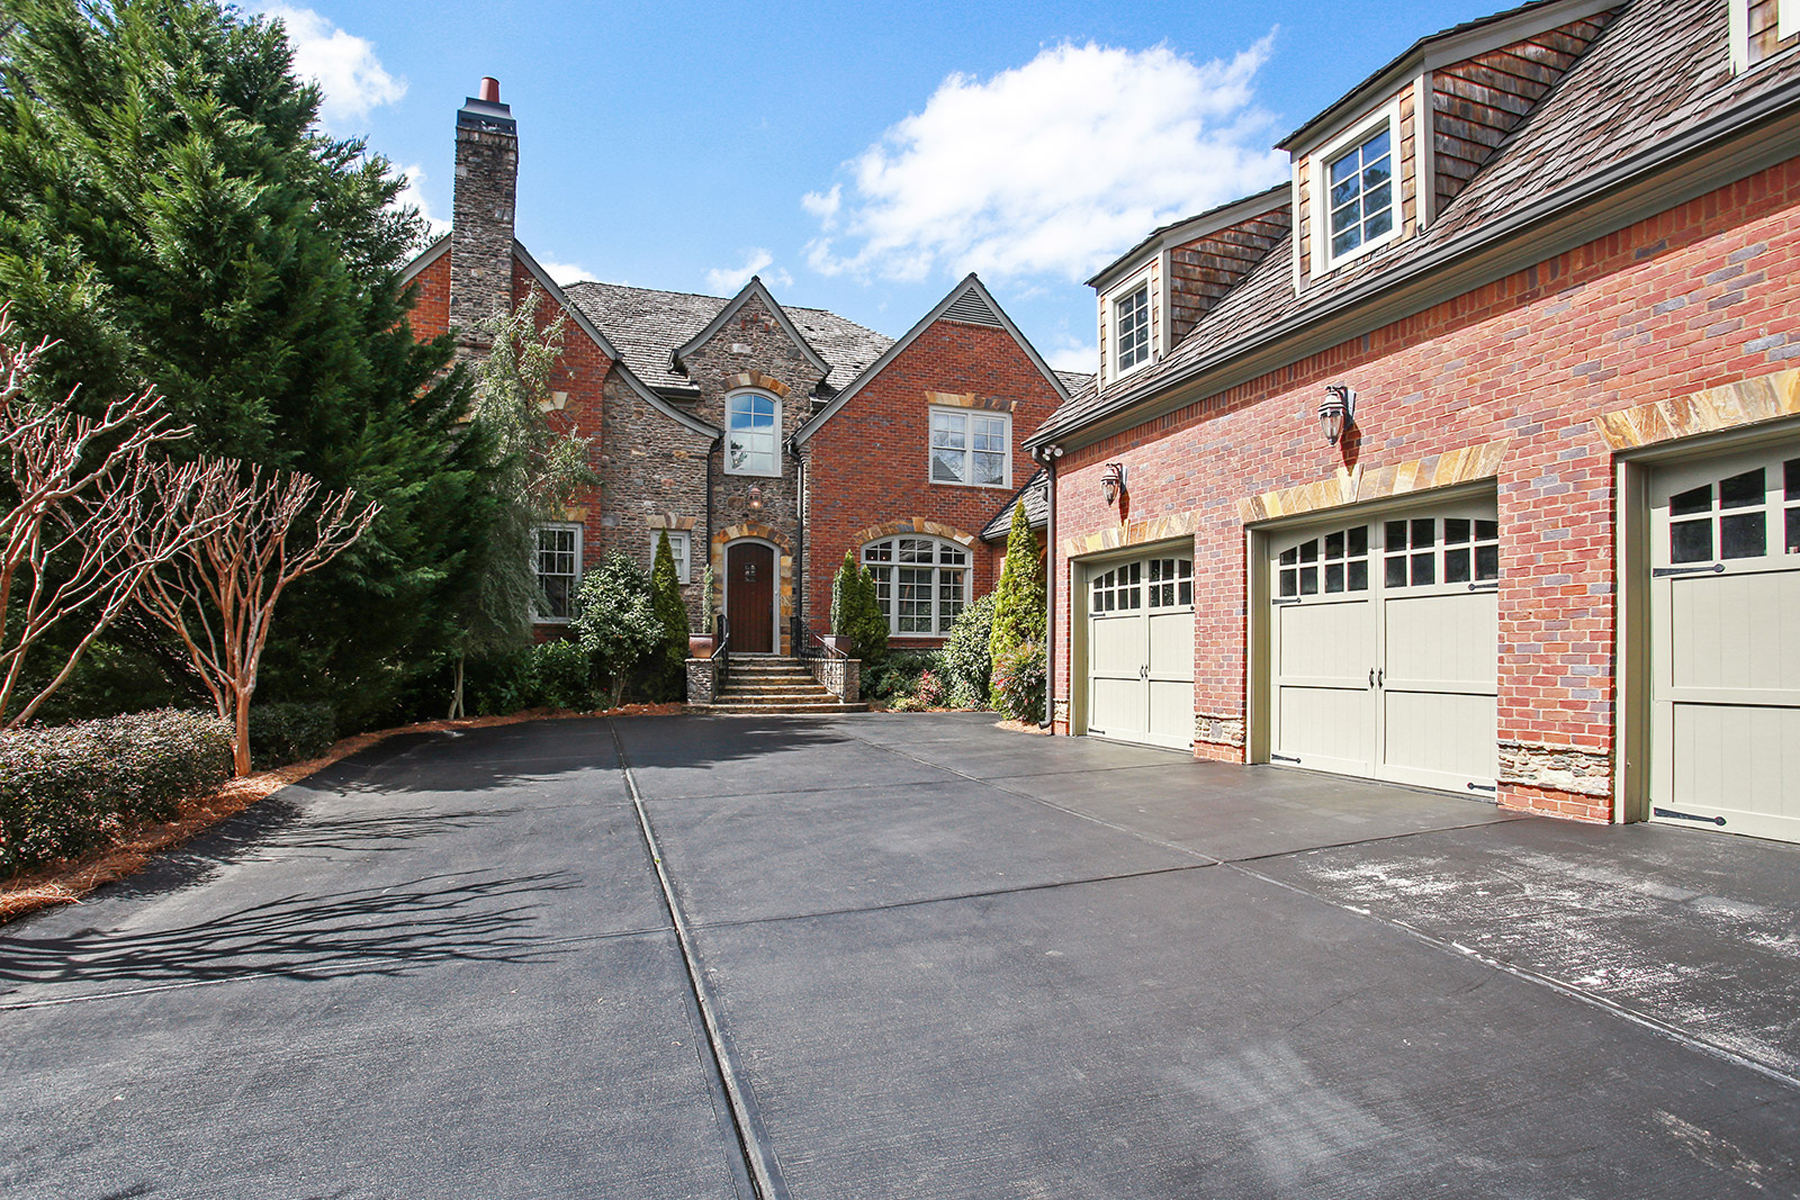 Single Family Home for Sale at Majestic European Estate 130 Ardsley Lane Alpharetta, Georgia, 30005 United States